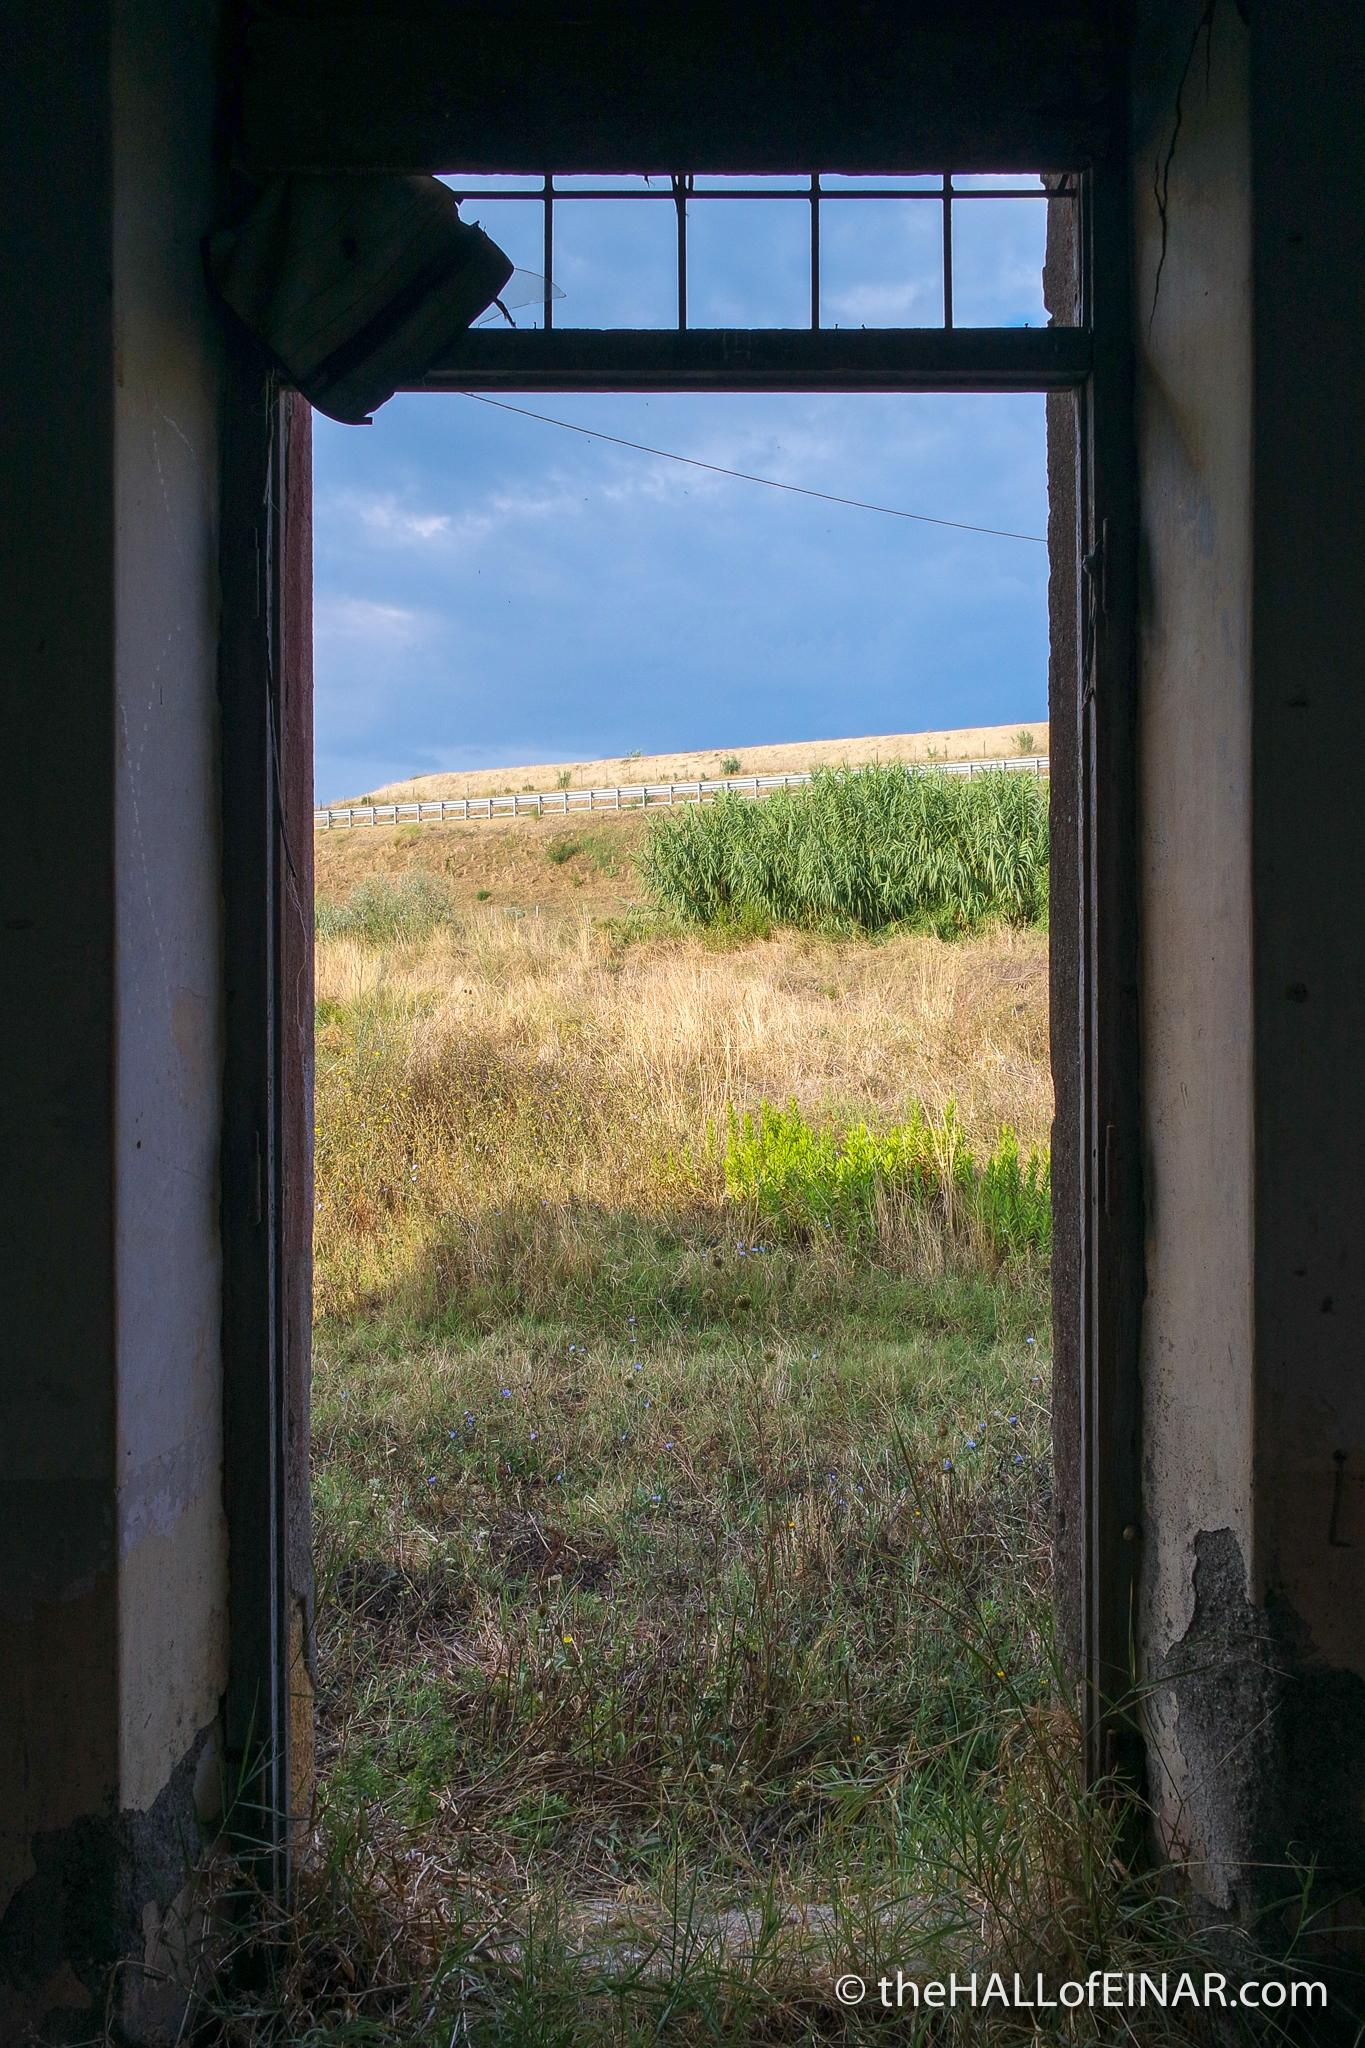 Tarquinia - The Hall of Einar - photograph (c) David Bailey (not the)